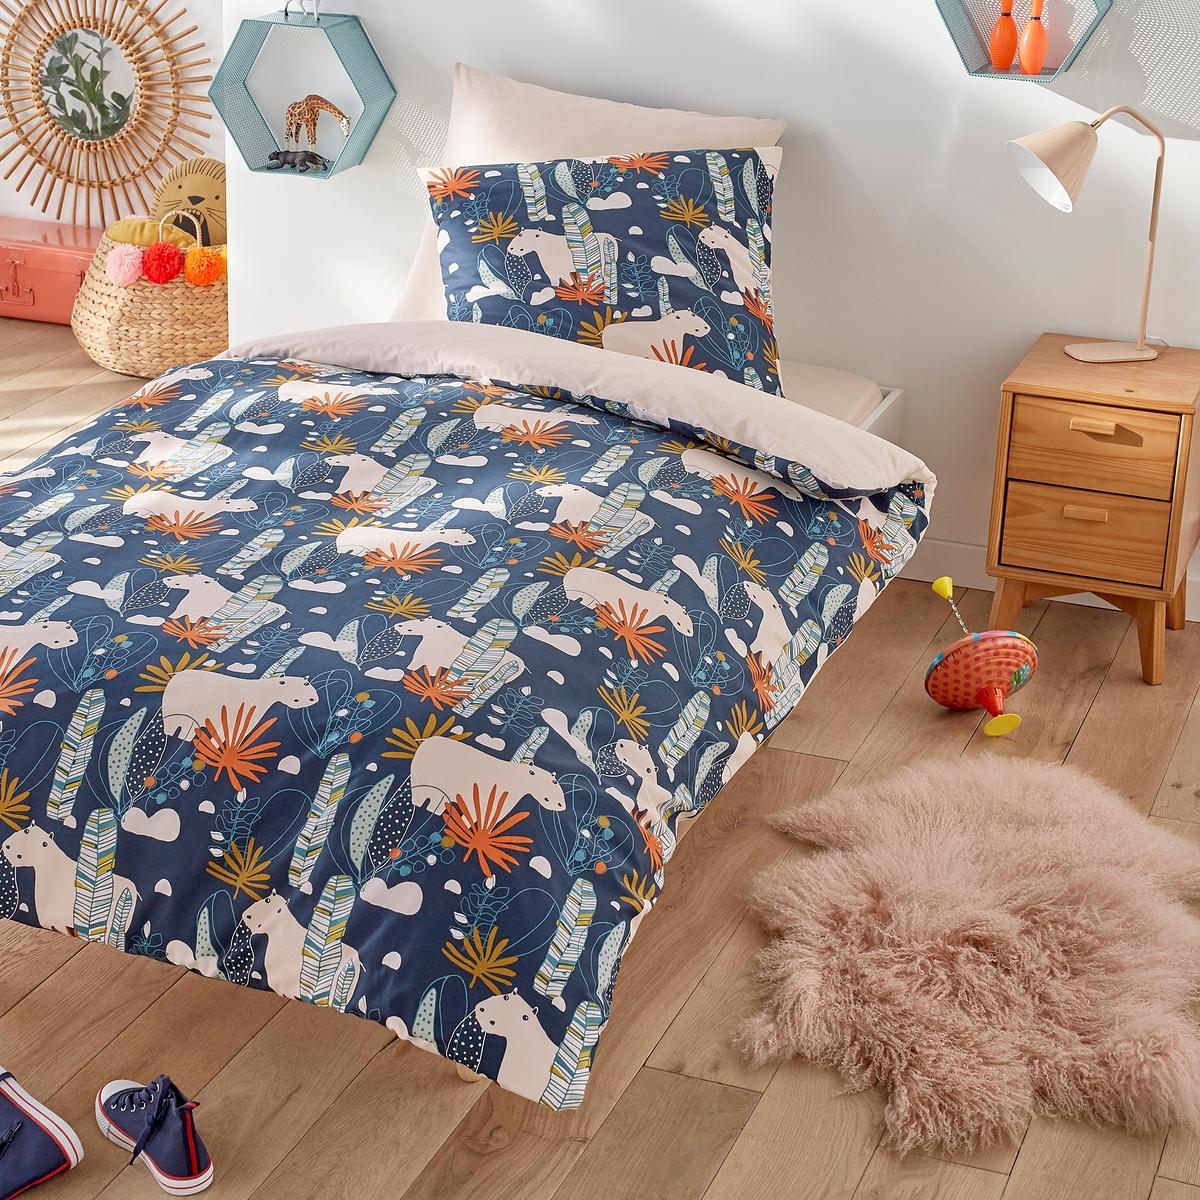 цена Пододеяльник La Redoute Детский POTAME 140 x 200 см синий онлайн в 2017 году